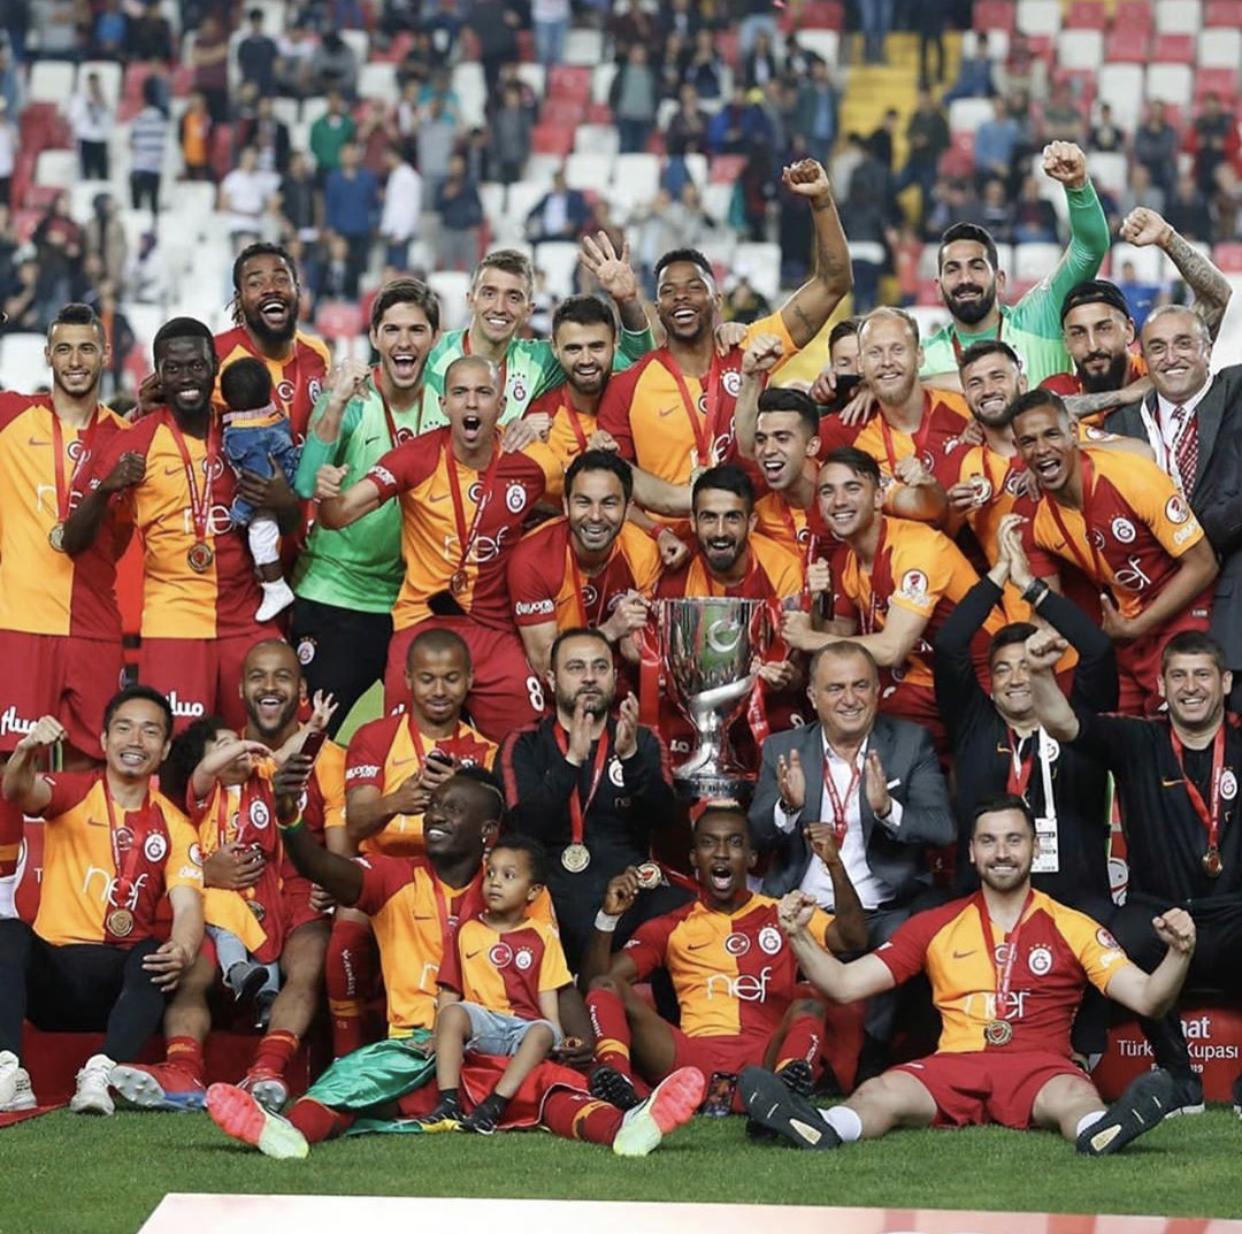 Coupe de Turquie : Mbaye Diagne buteur, remporte la finale avec Galatasaray. (Akhisar 1-3 Galatasaray)